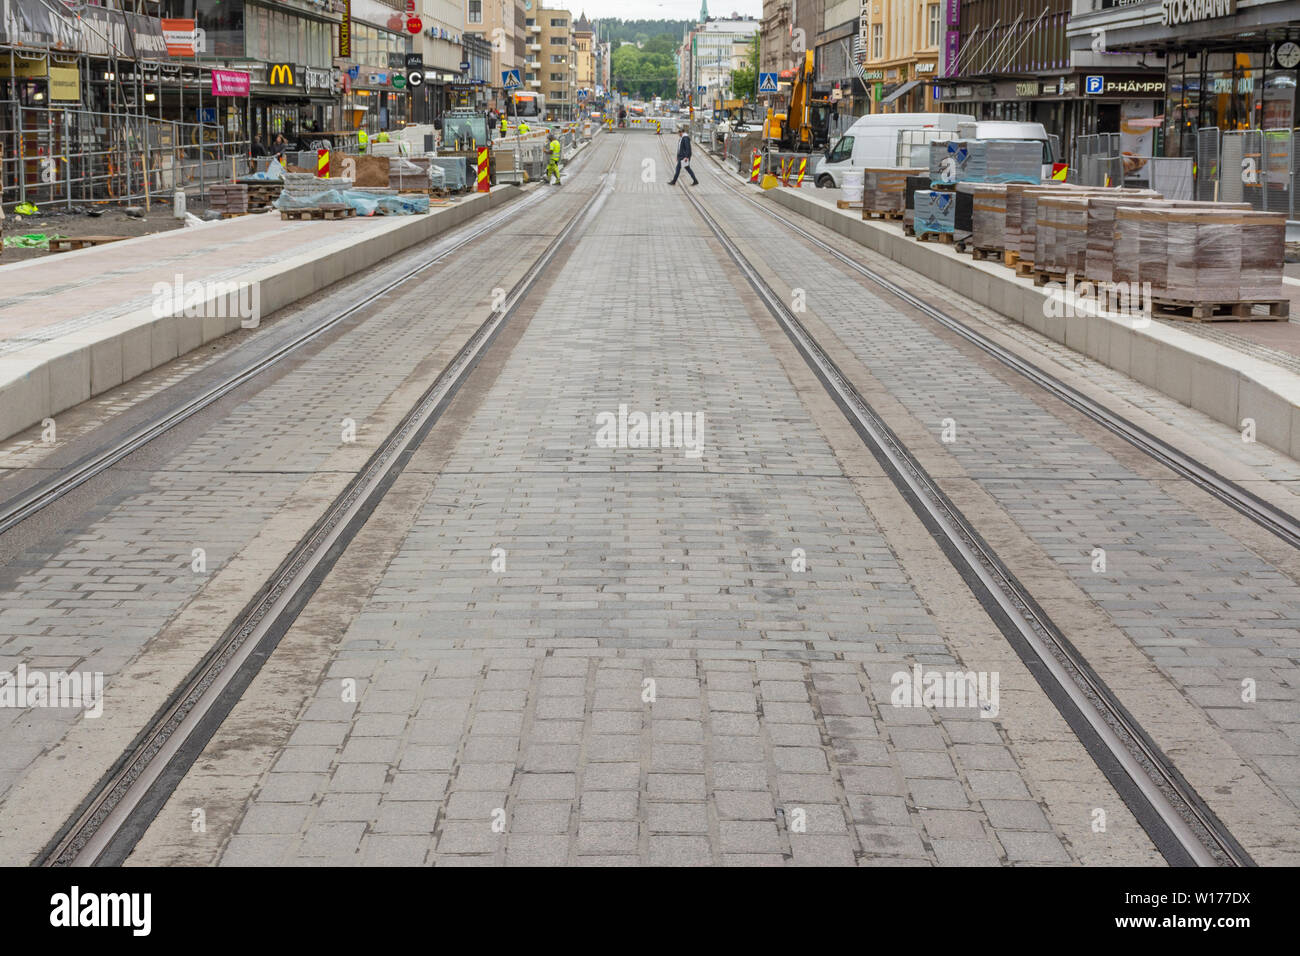 Tram Tracks Been Built on Hämeenkatu Street in Tampere Finland - Stock Image